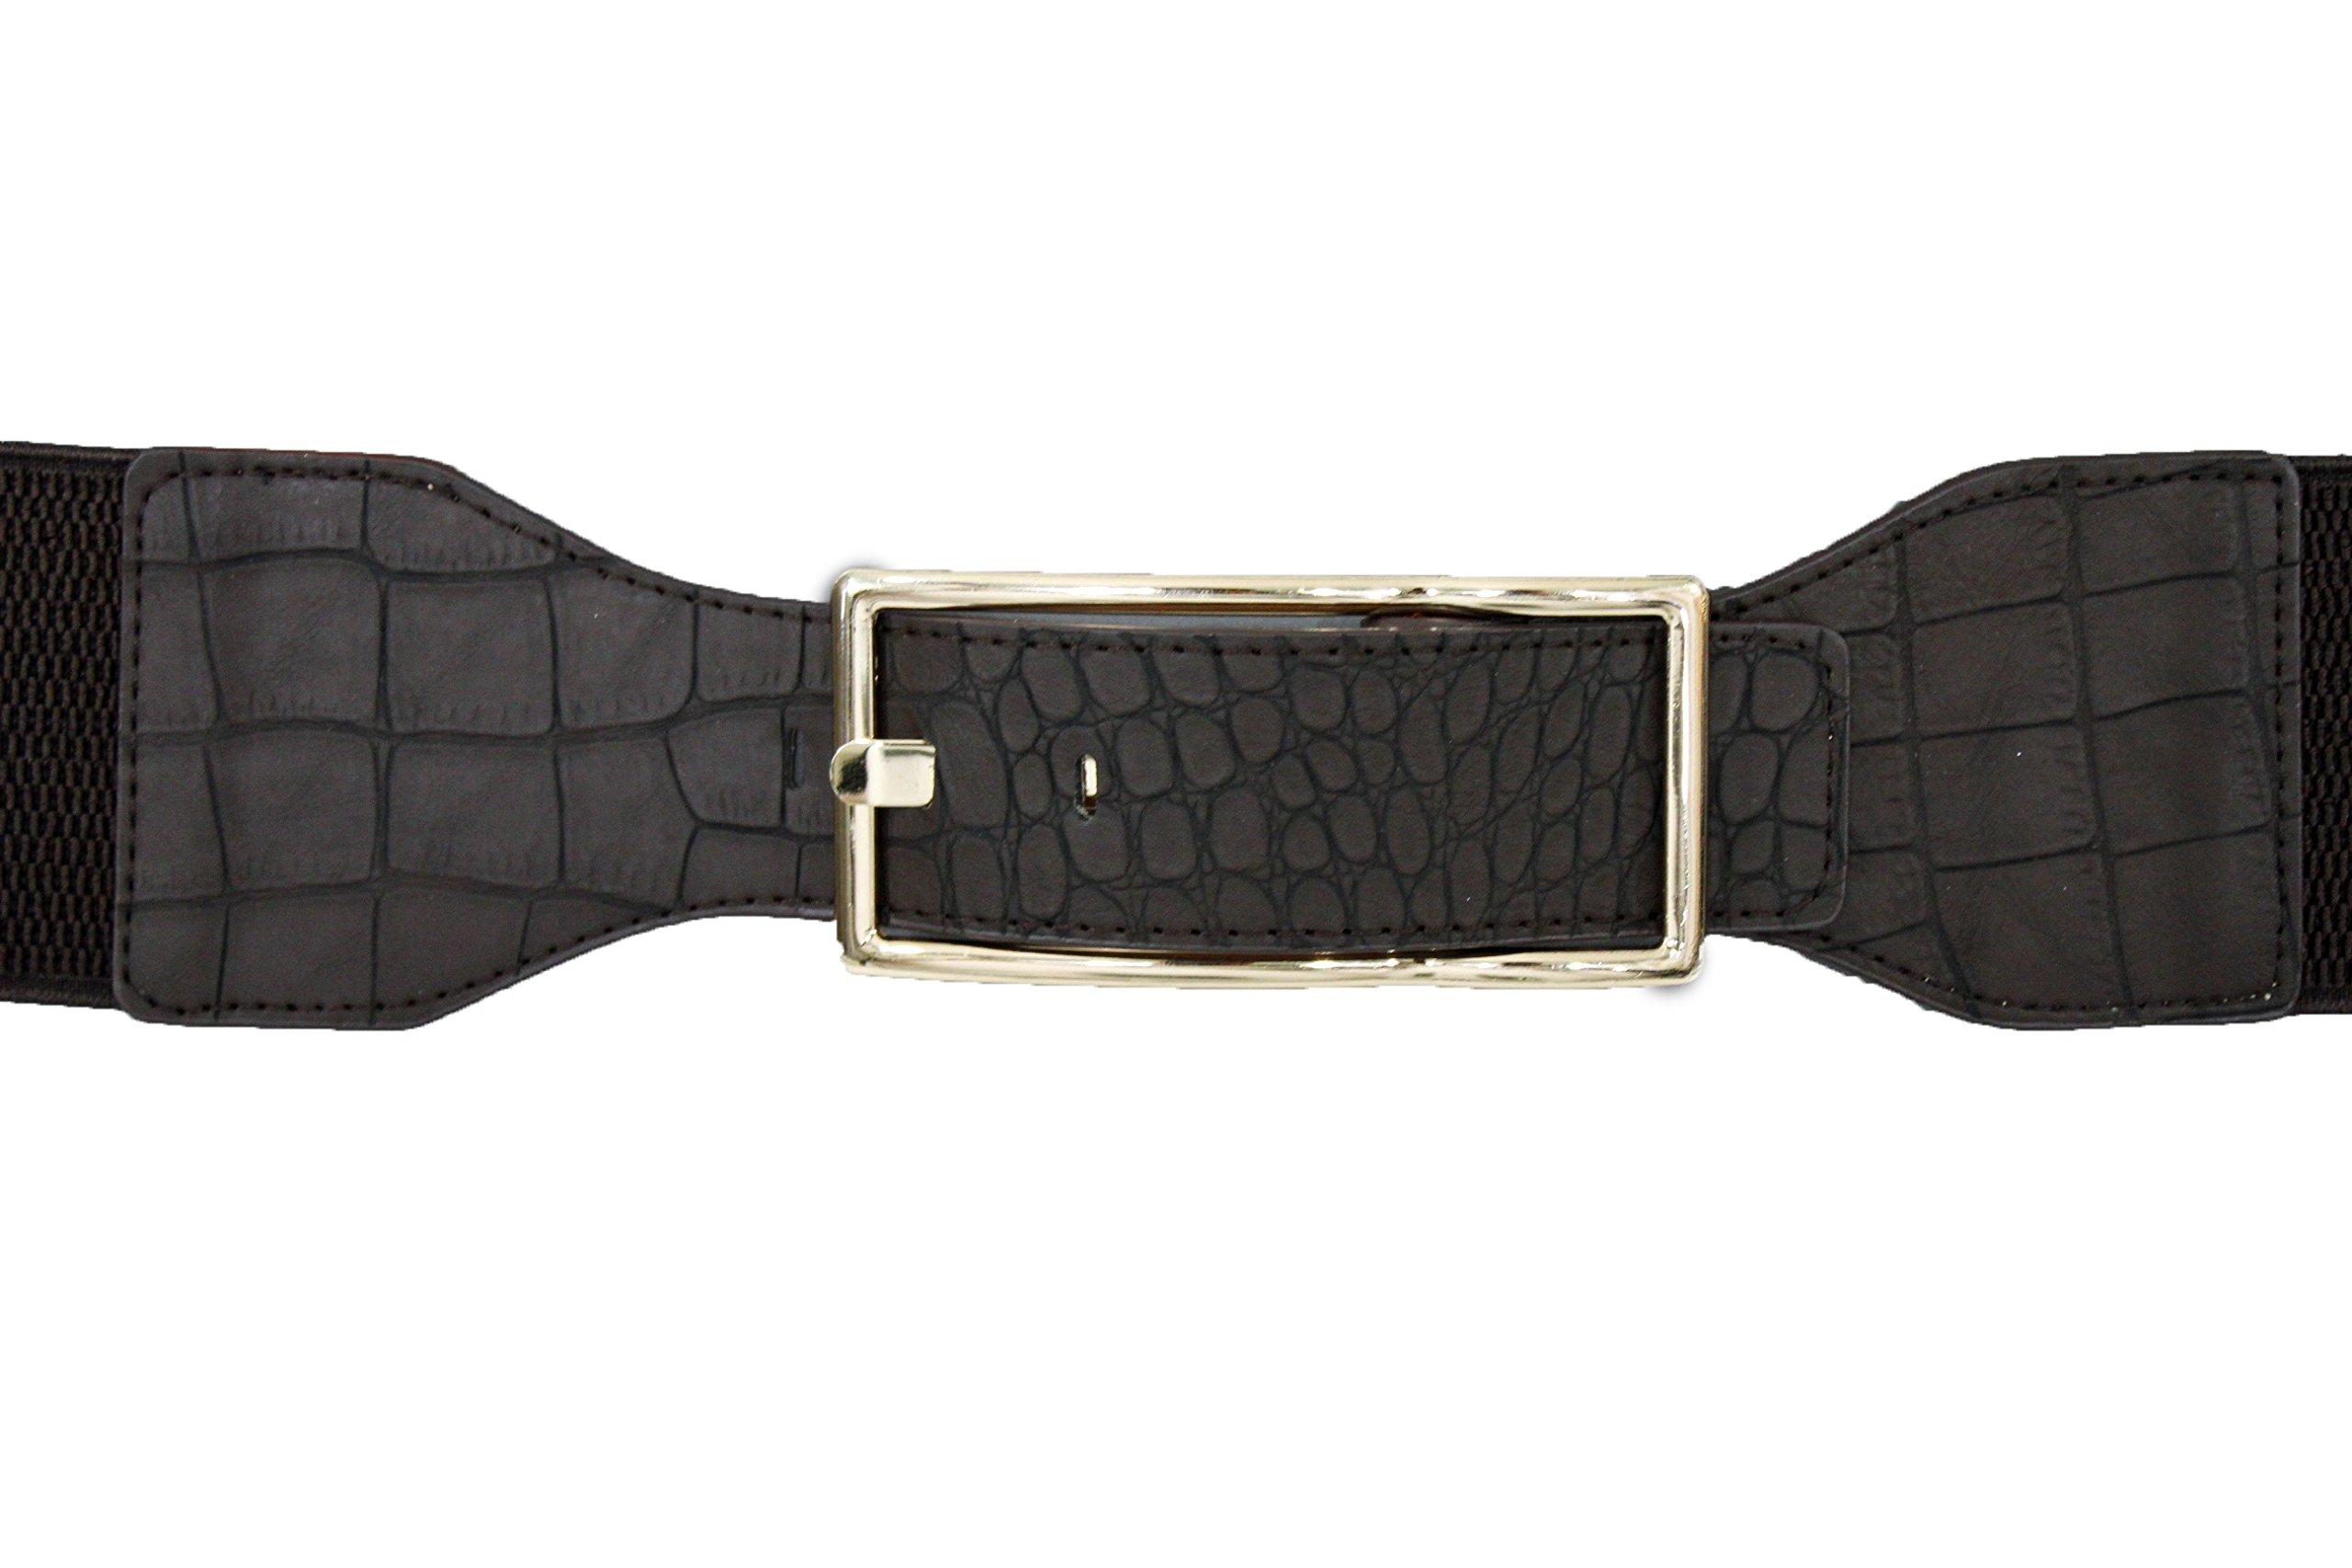 TFJ Women's Fashion Belt Hip Waist Faux Leather Long Gold Metal Buckle Plus Size Medium Large (Brown)